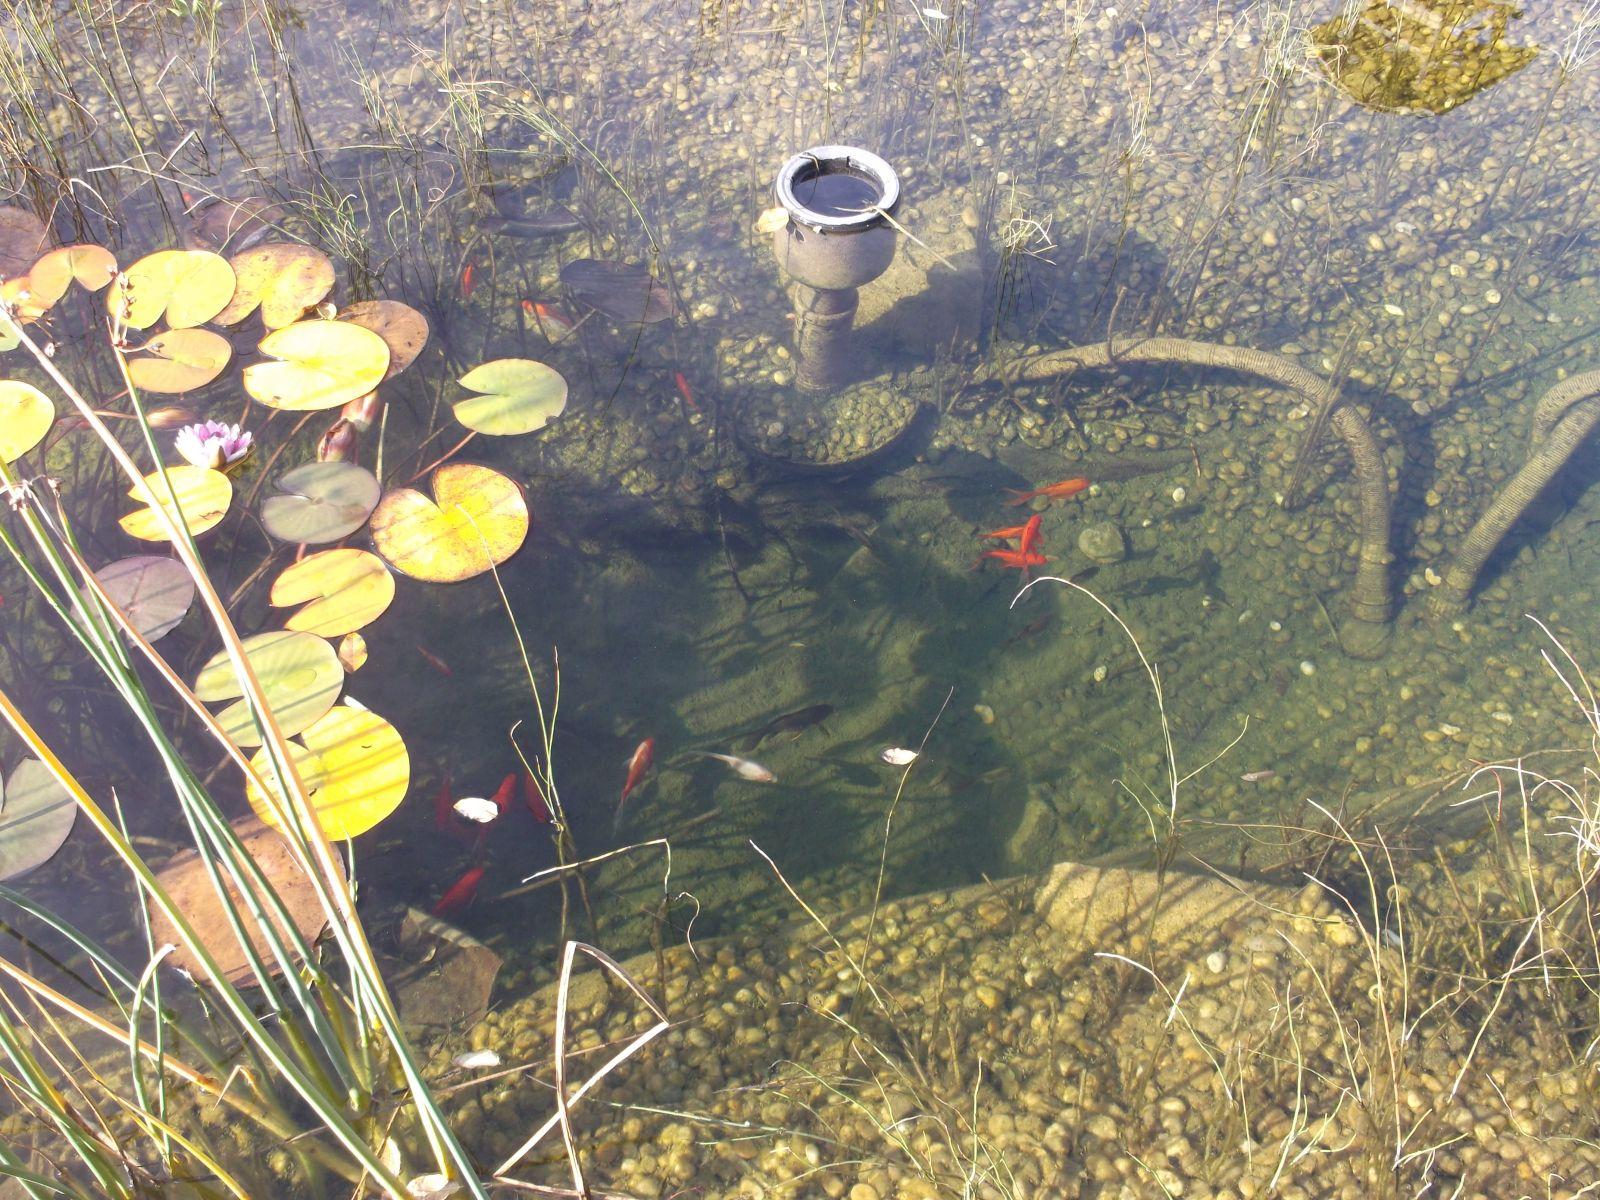 scd pond referencia